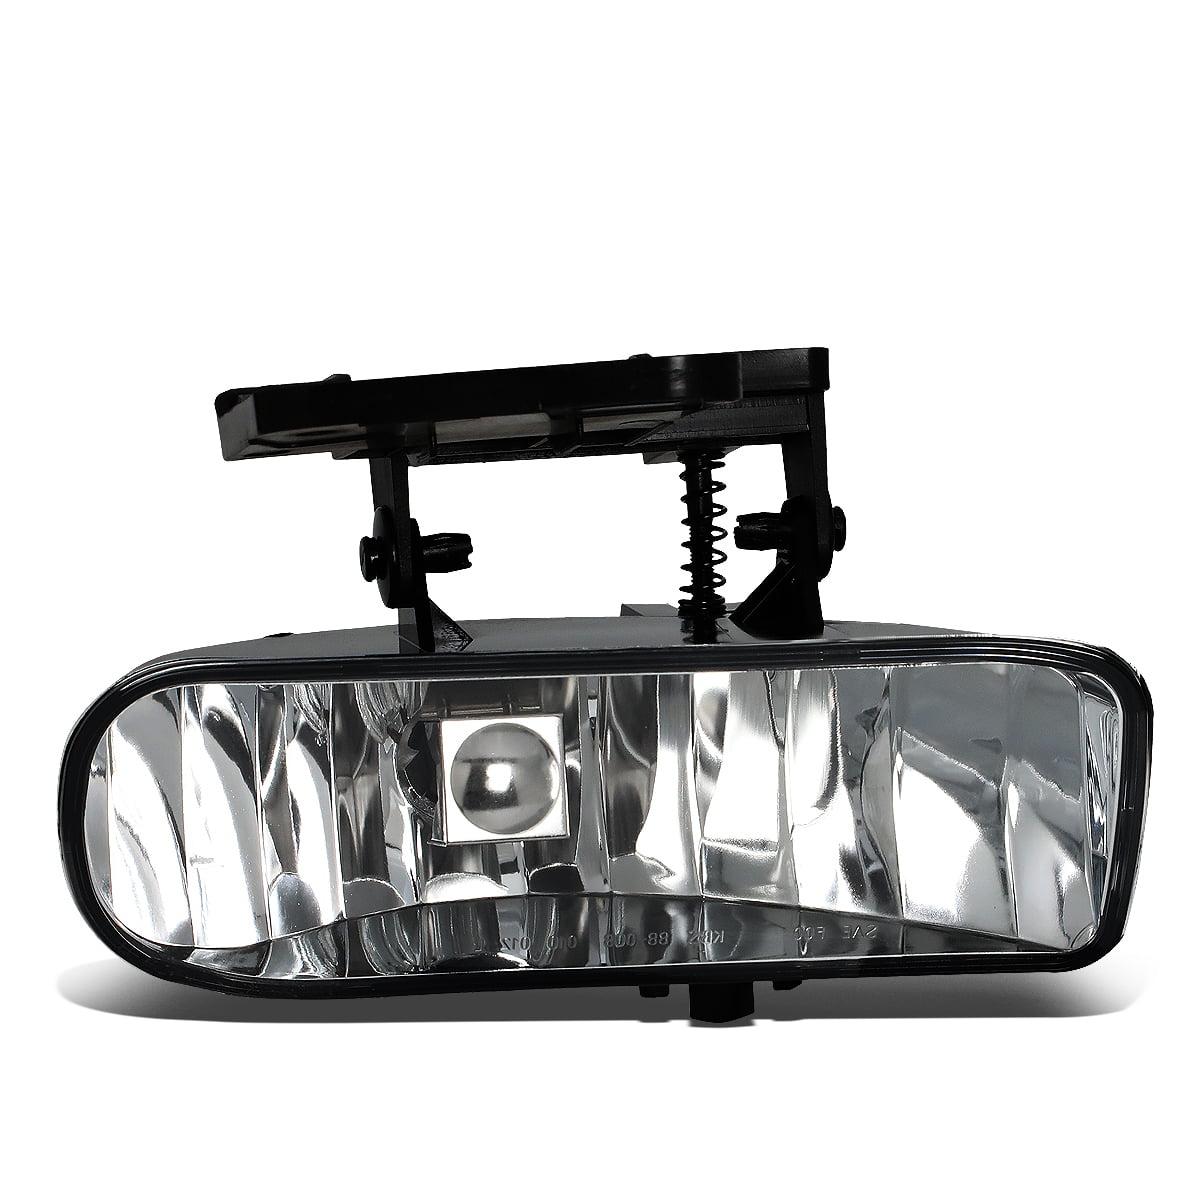 For 99-06 GMC Sierra 1500 2500 3500/Yukon XL Front Bumper Fog Light/Lamp Factory Style Right Side 00 01 02 03 04 05